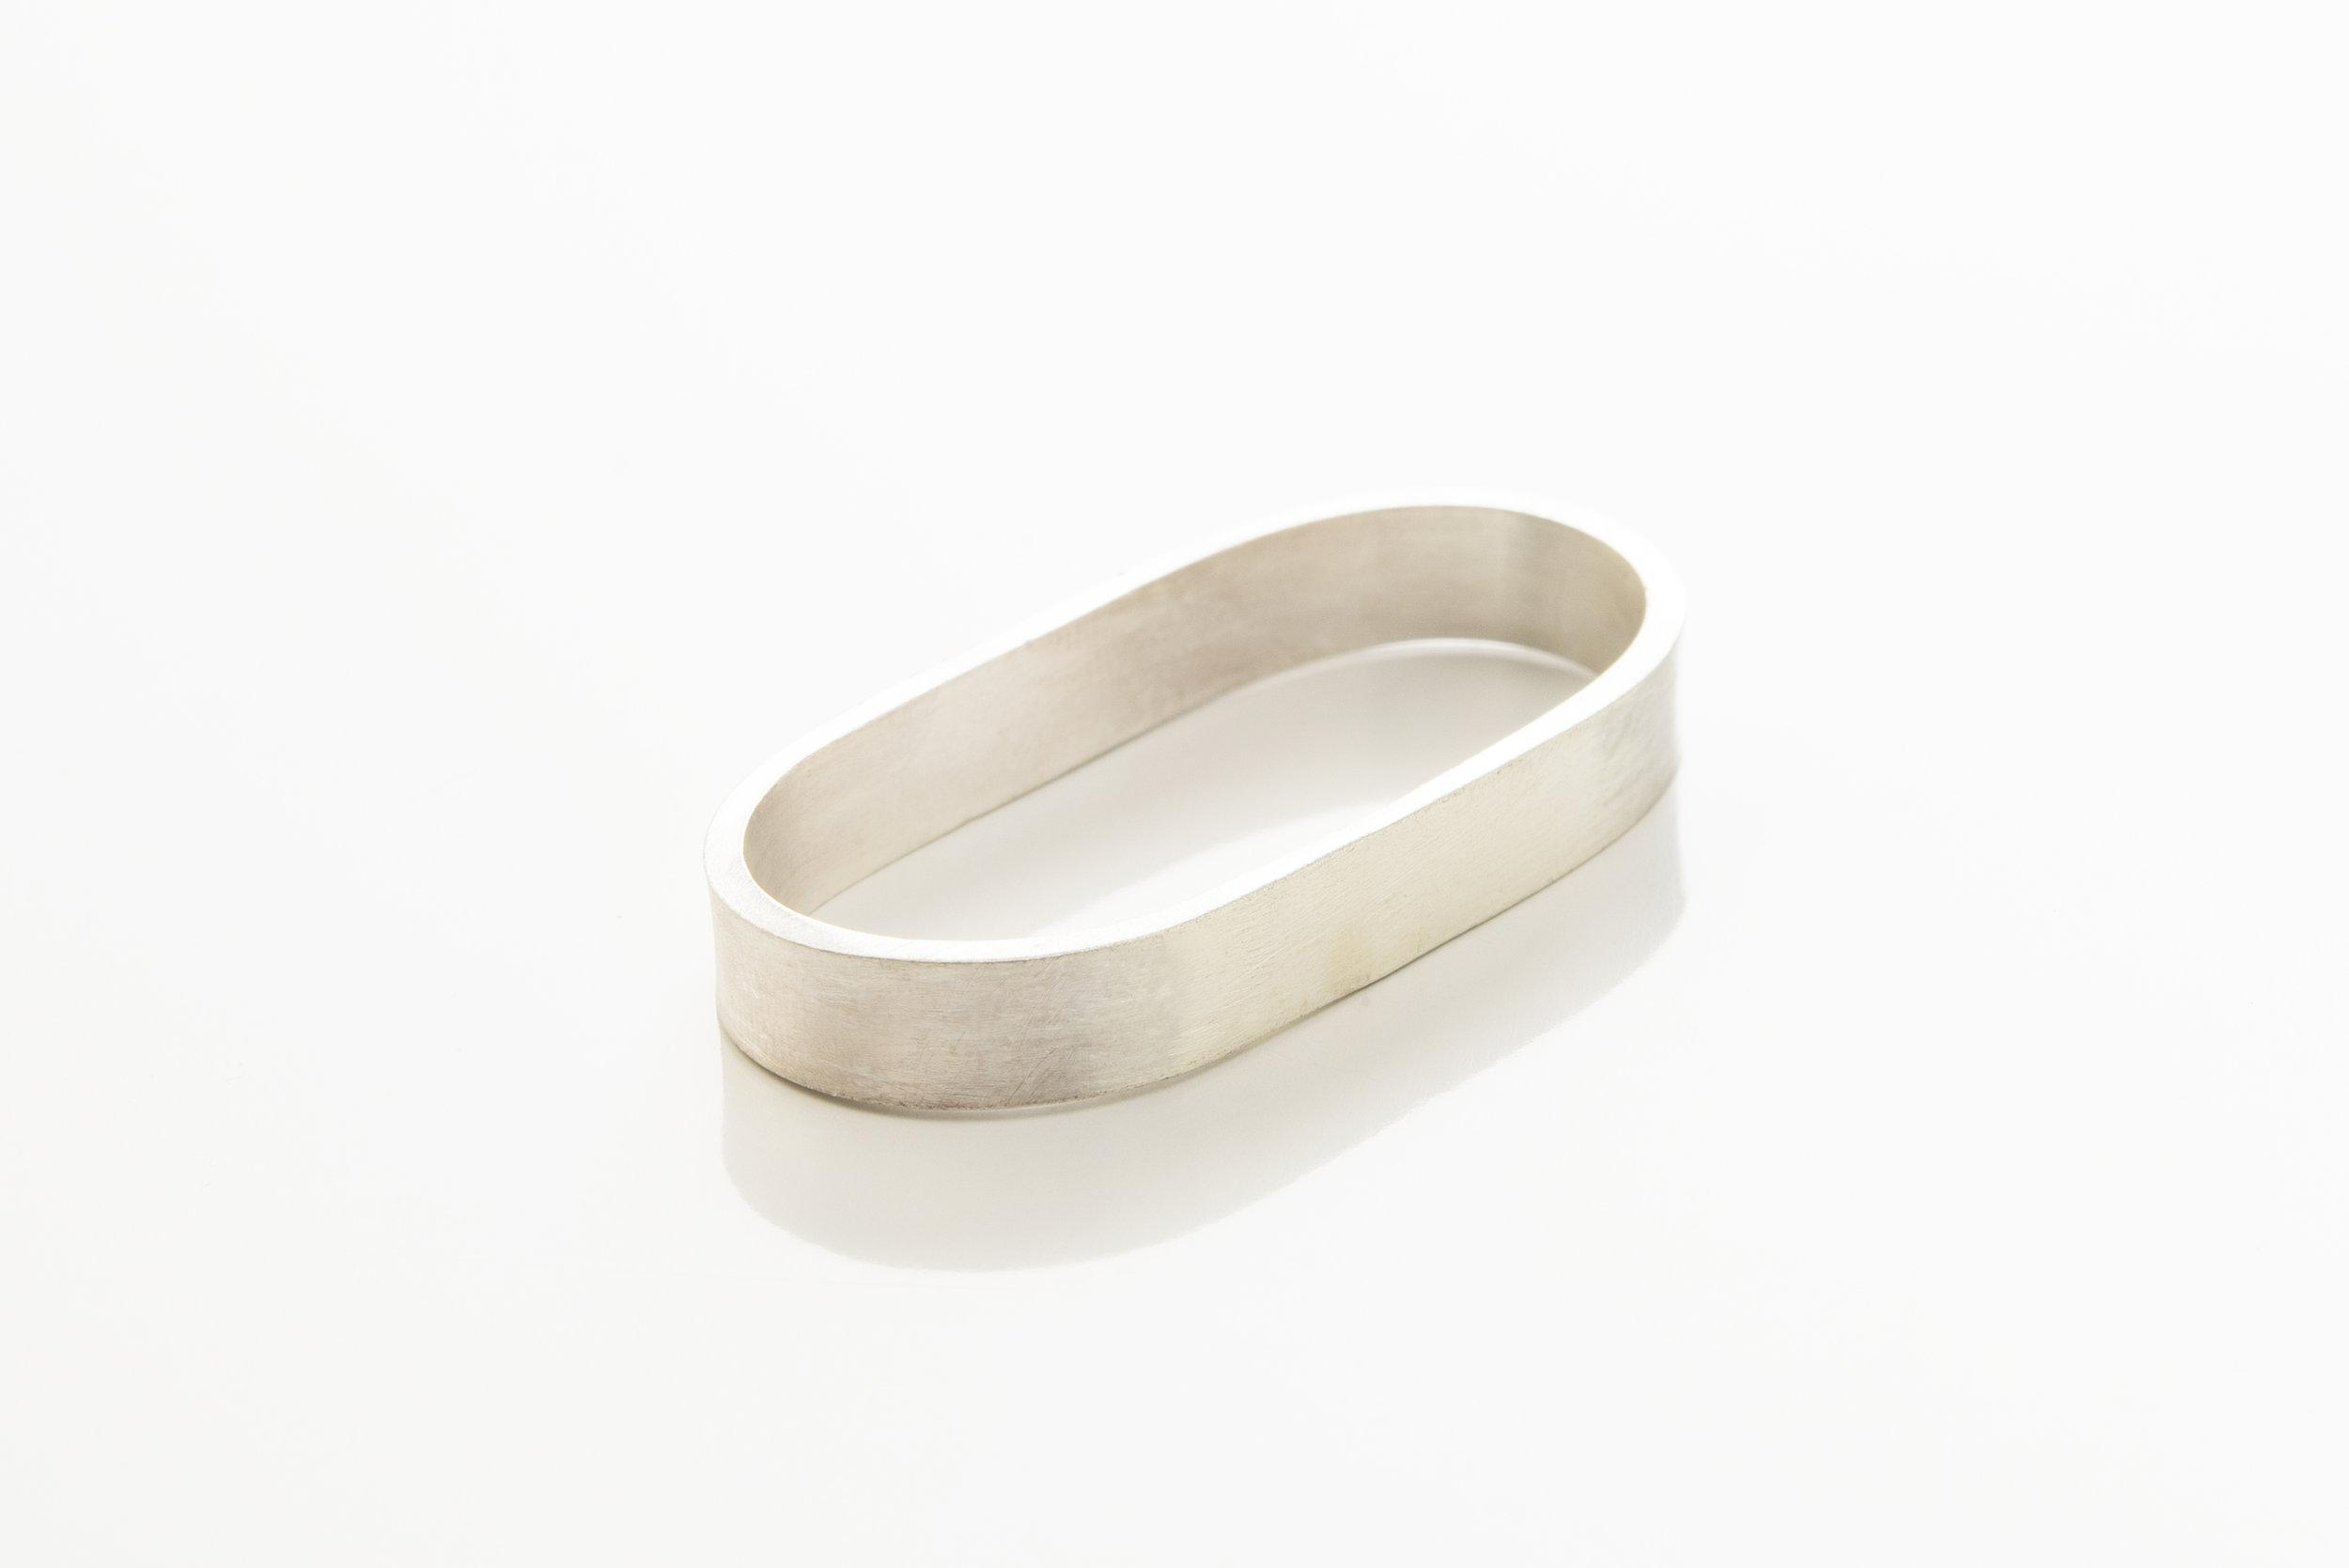 08_Ulterior_double ring.jpg